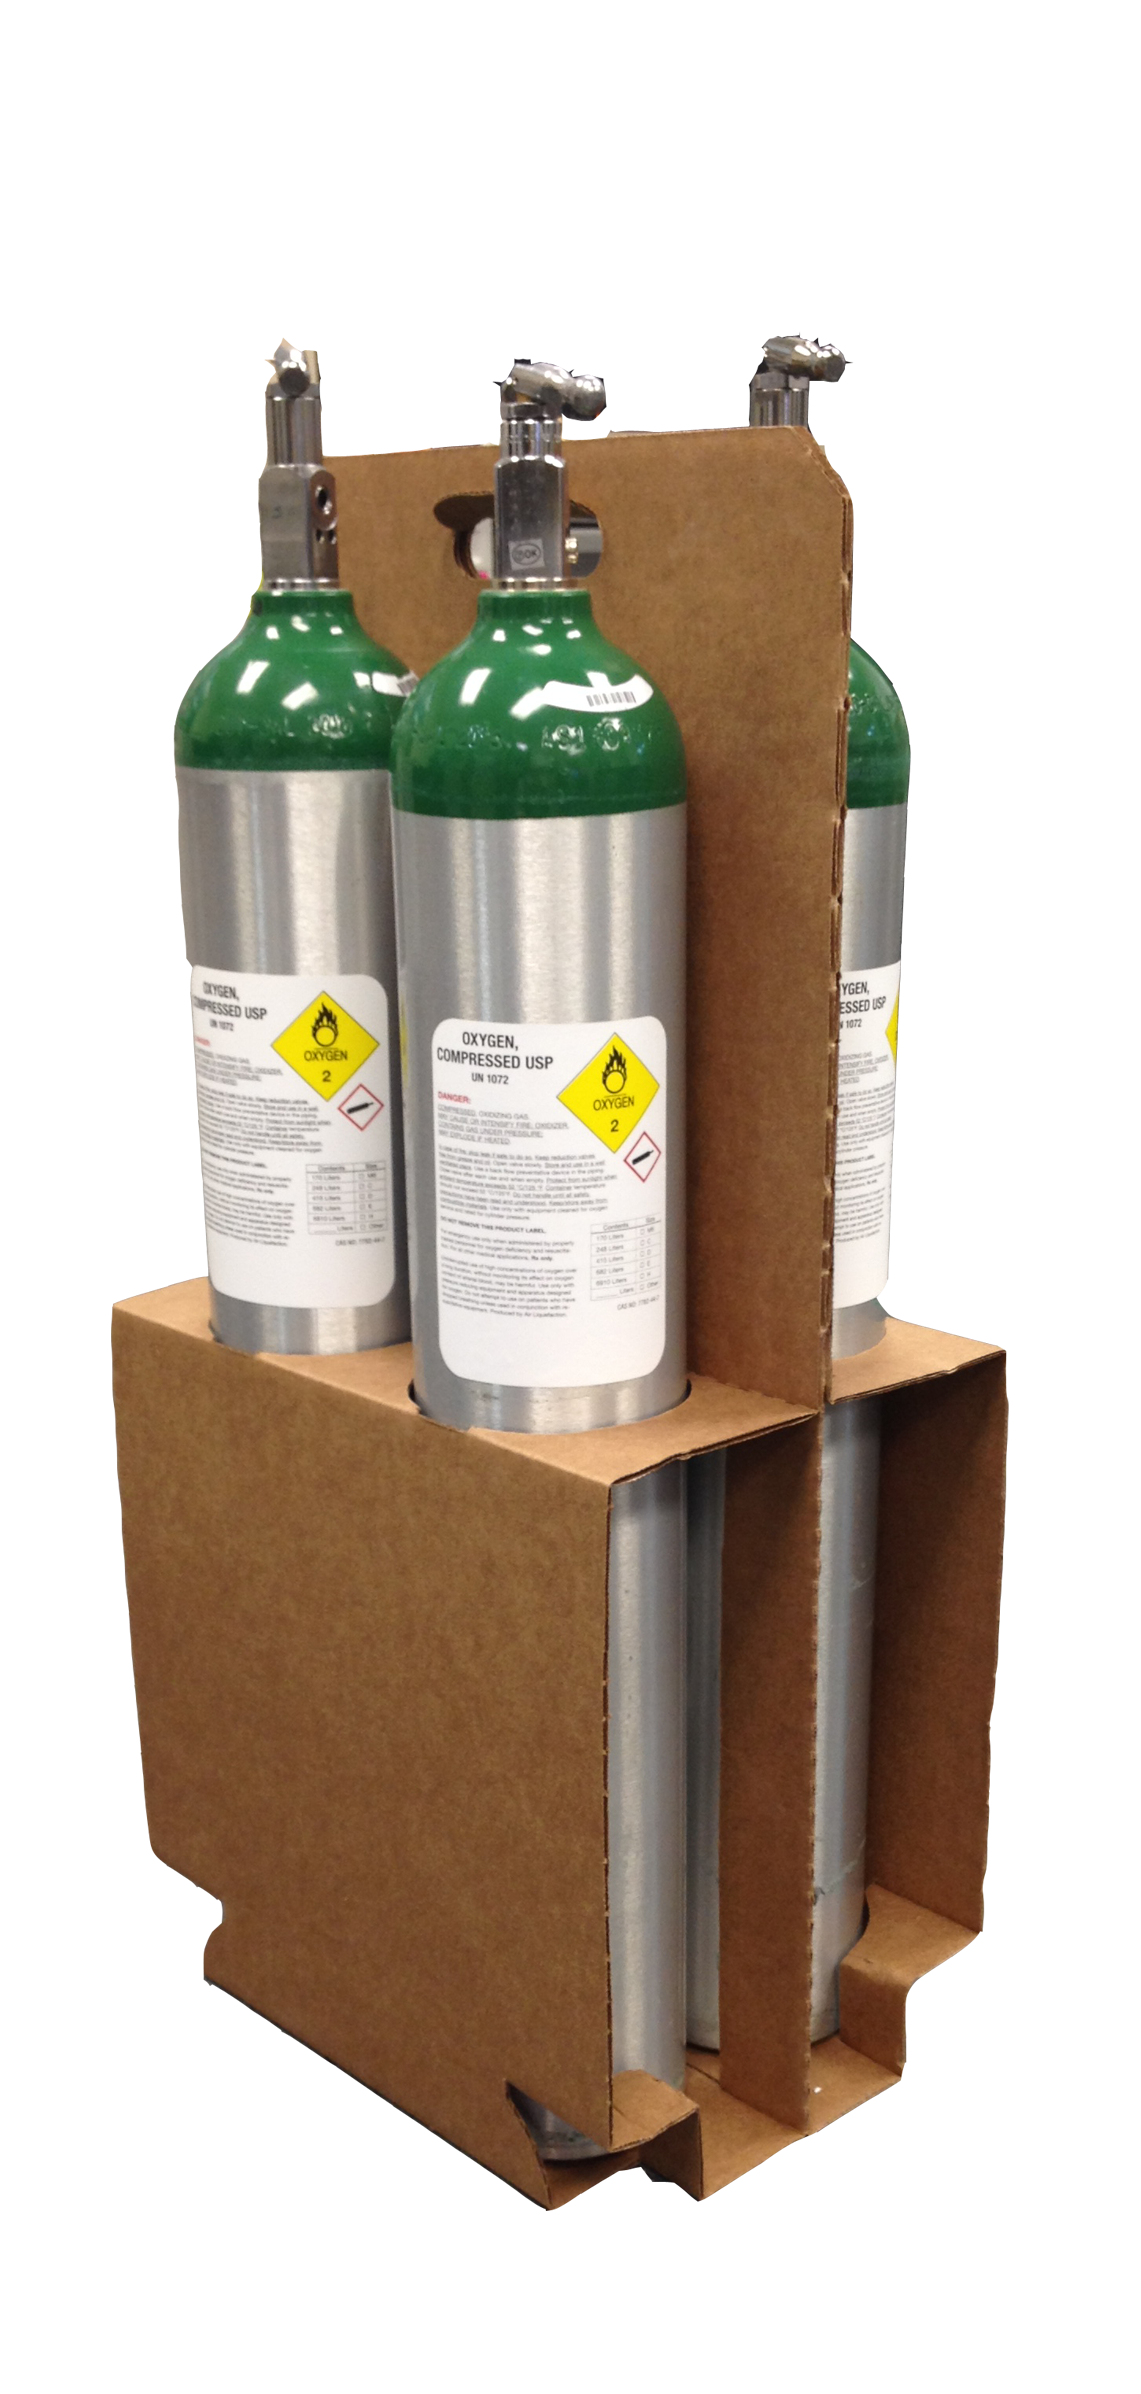 1170-0158-1 Cylinder Carrier Box